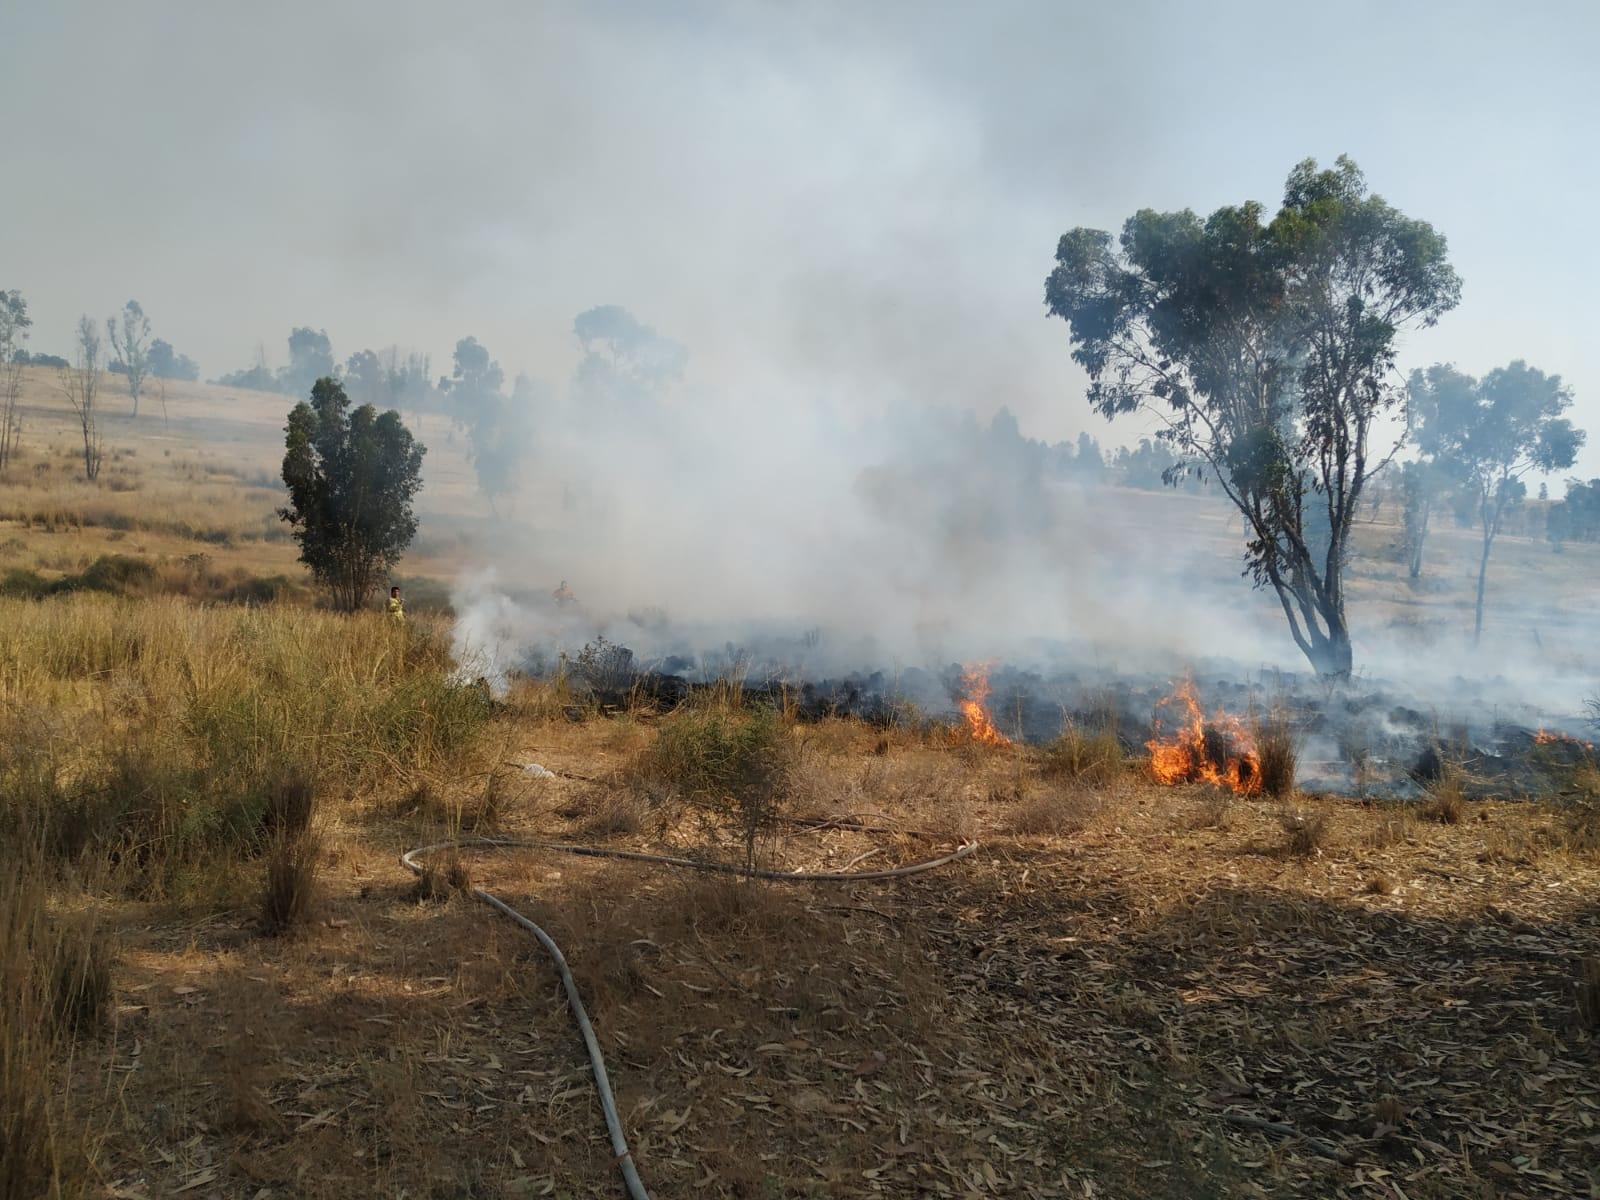 Incendiary balloon sparks blaze in Gaza border region | The